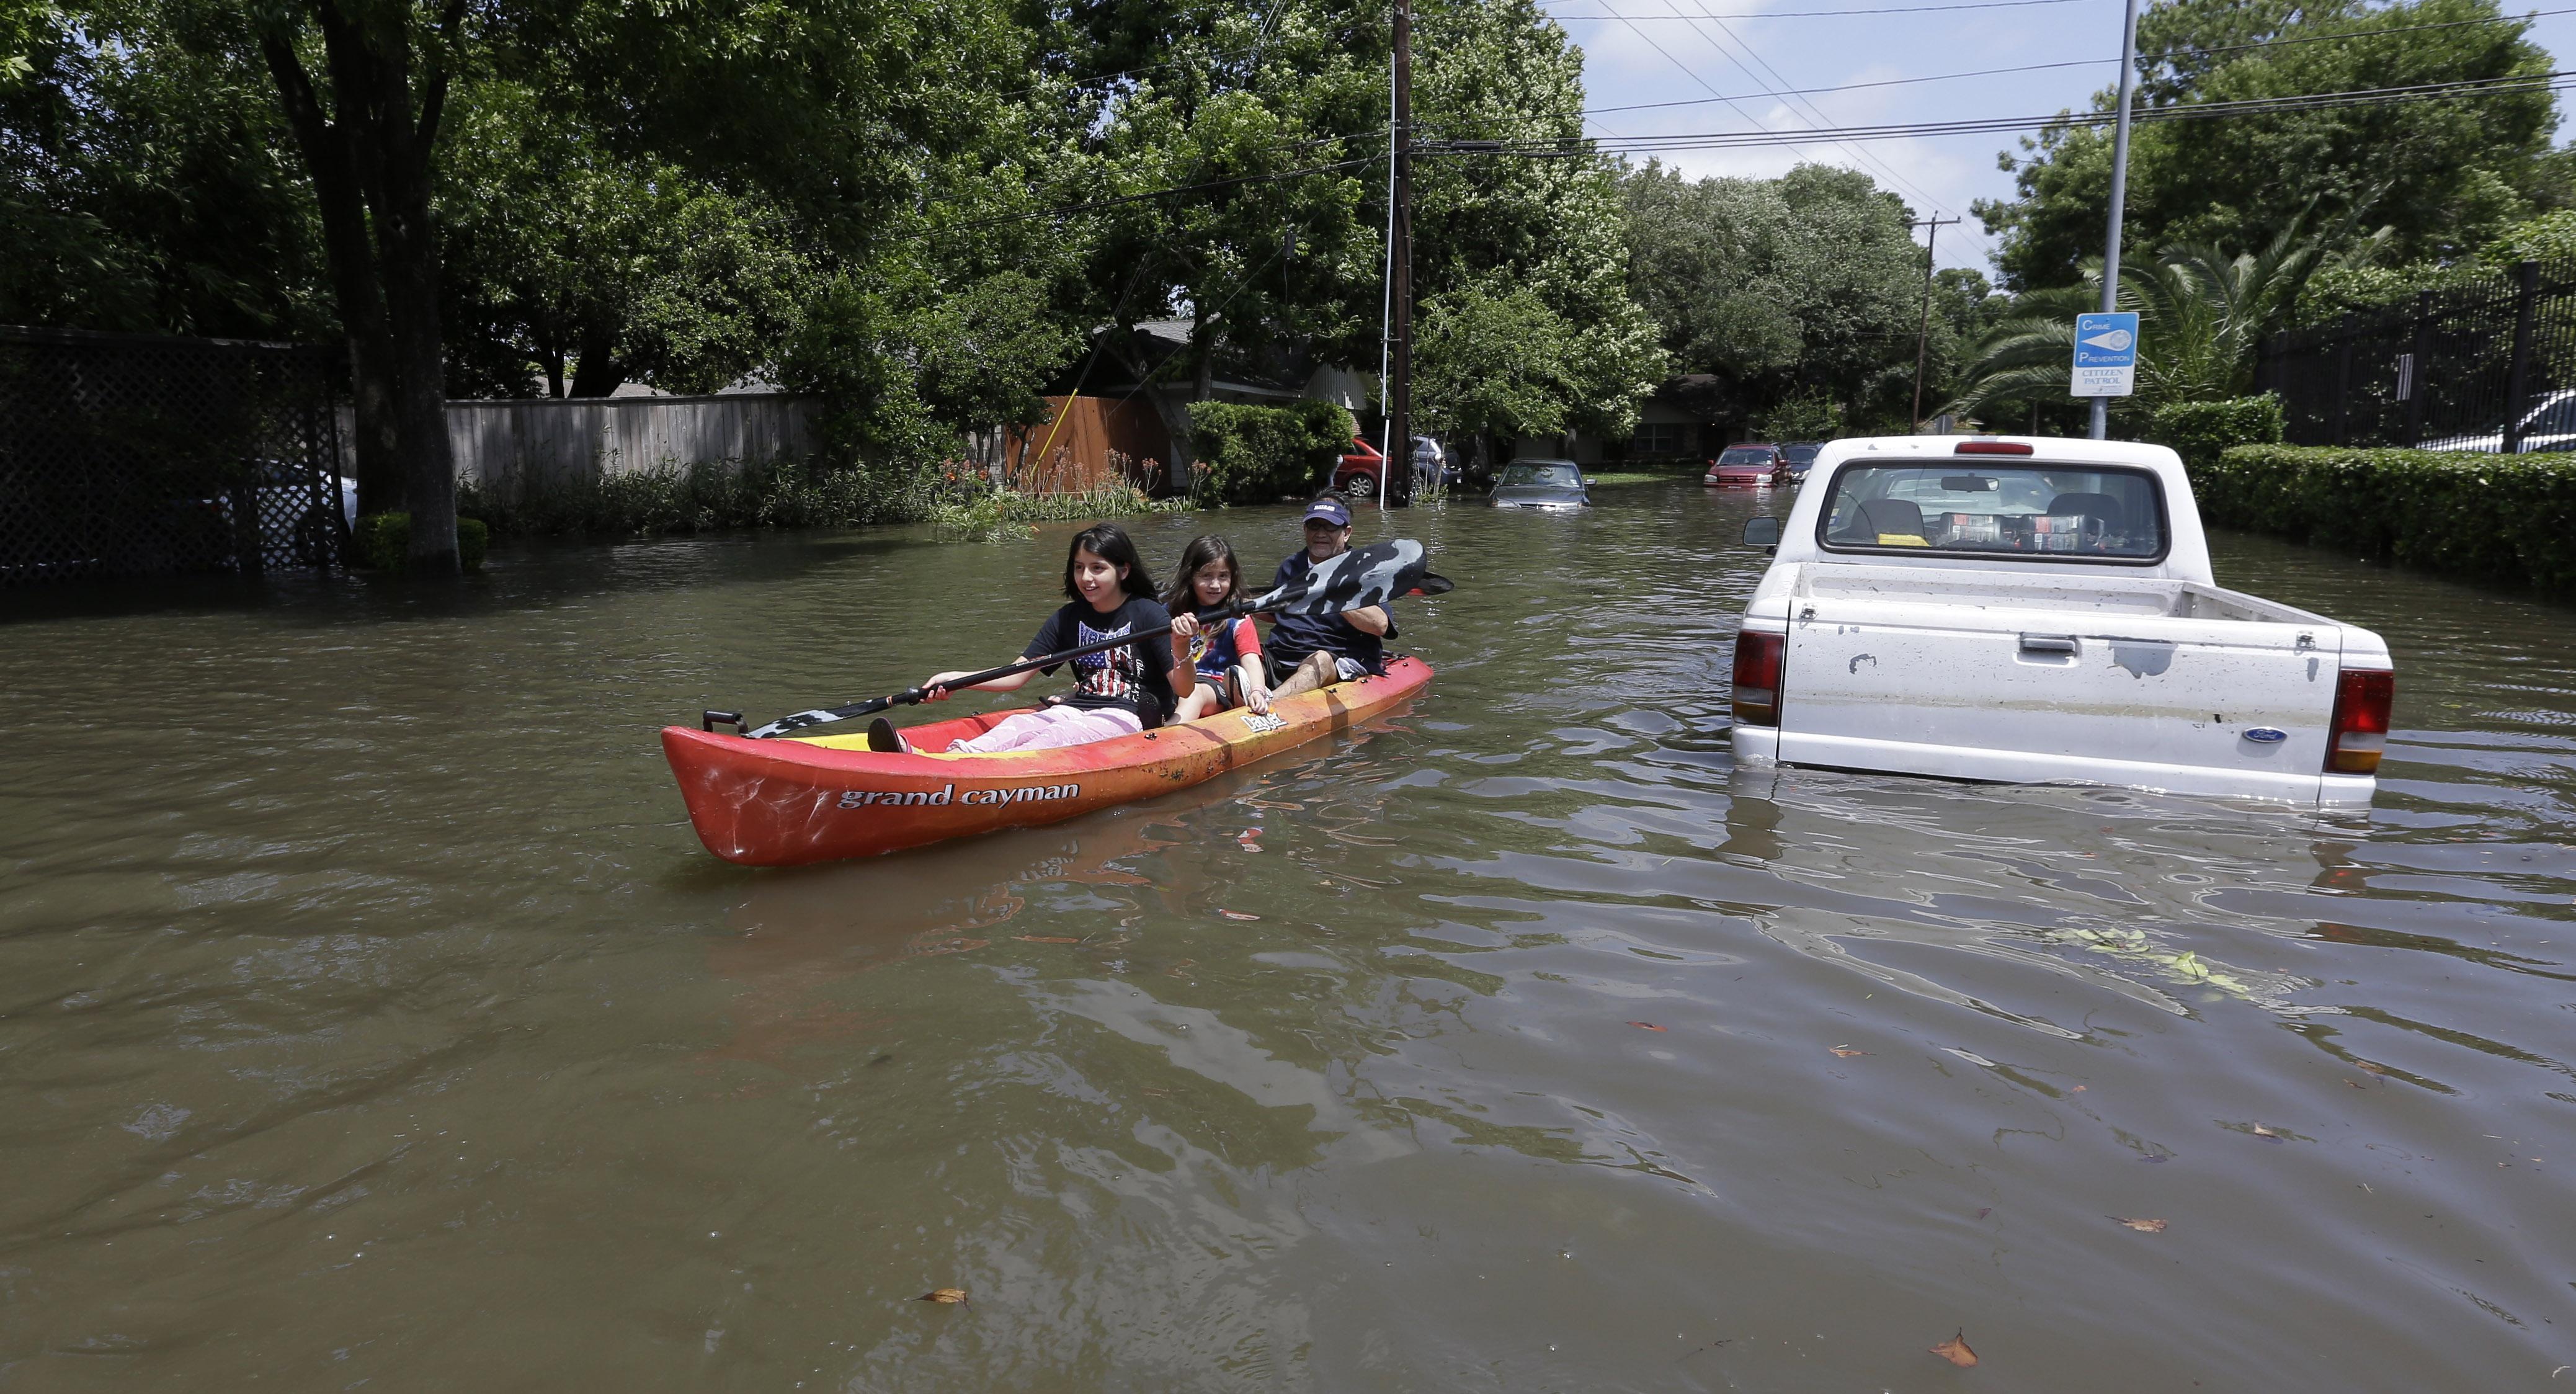 Ford Dealership San Antonio >> Did climate change, El Nino make Texas floods worse? - CBS ...